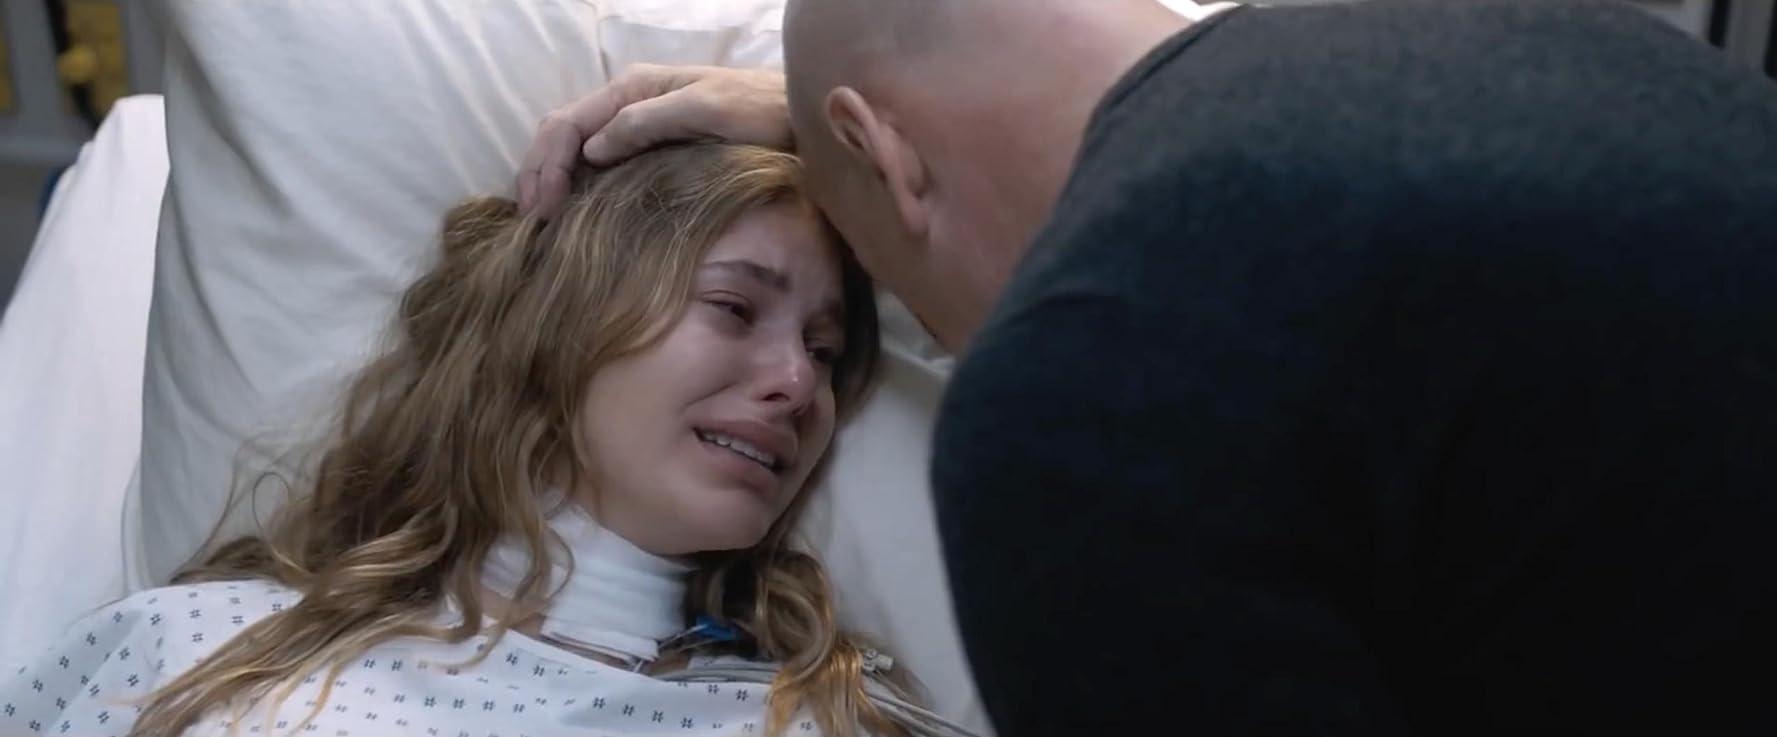 Bruce Willis and Camila Morrone in Death Wish (2018)